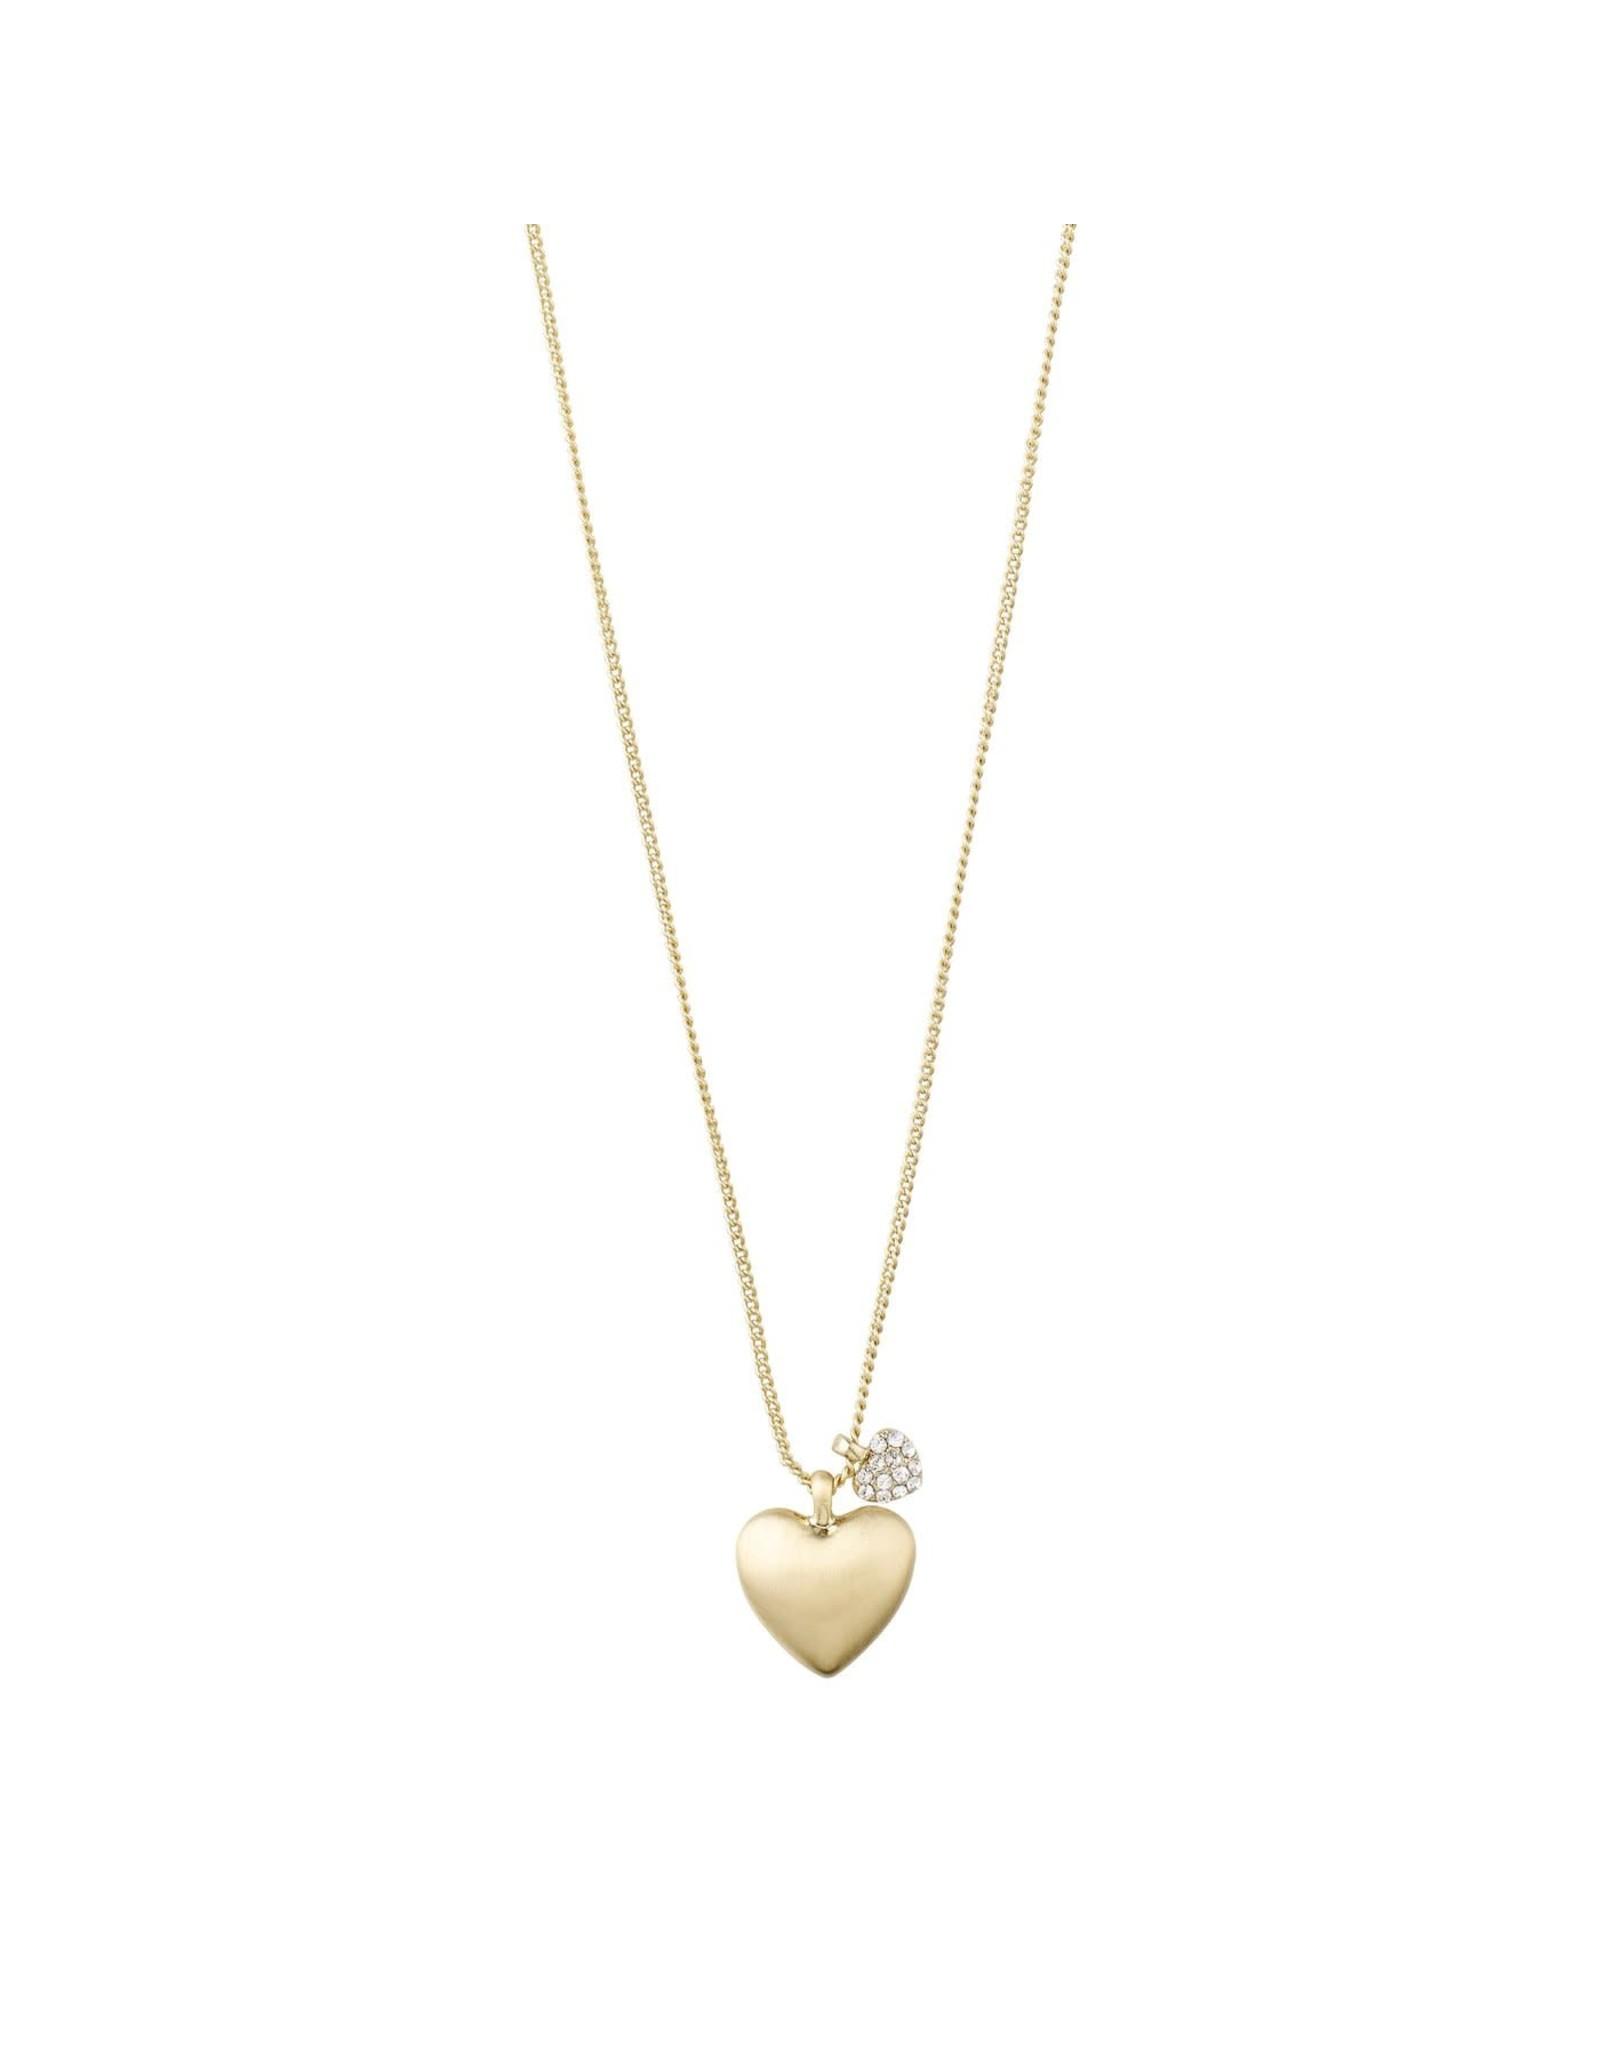 Pilgrim Pilgrim Heart Charm Necklace